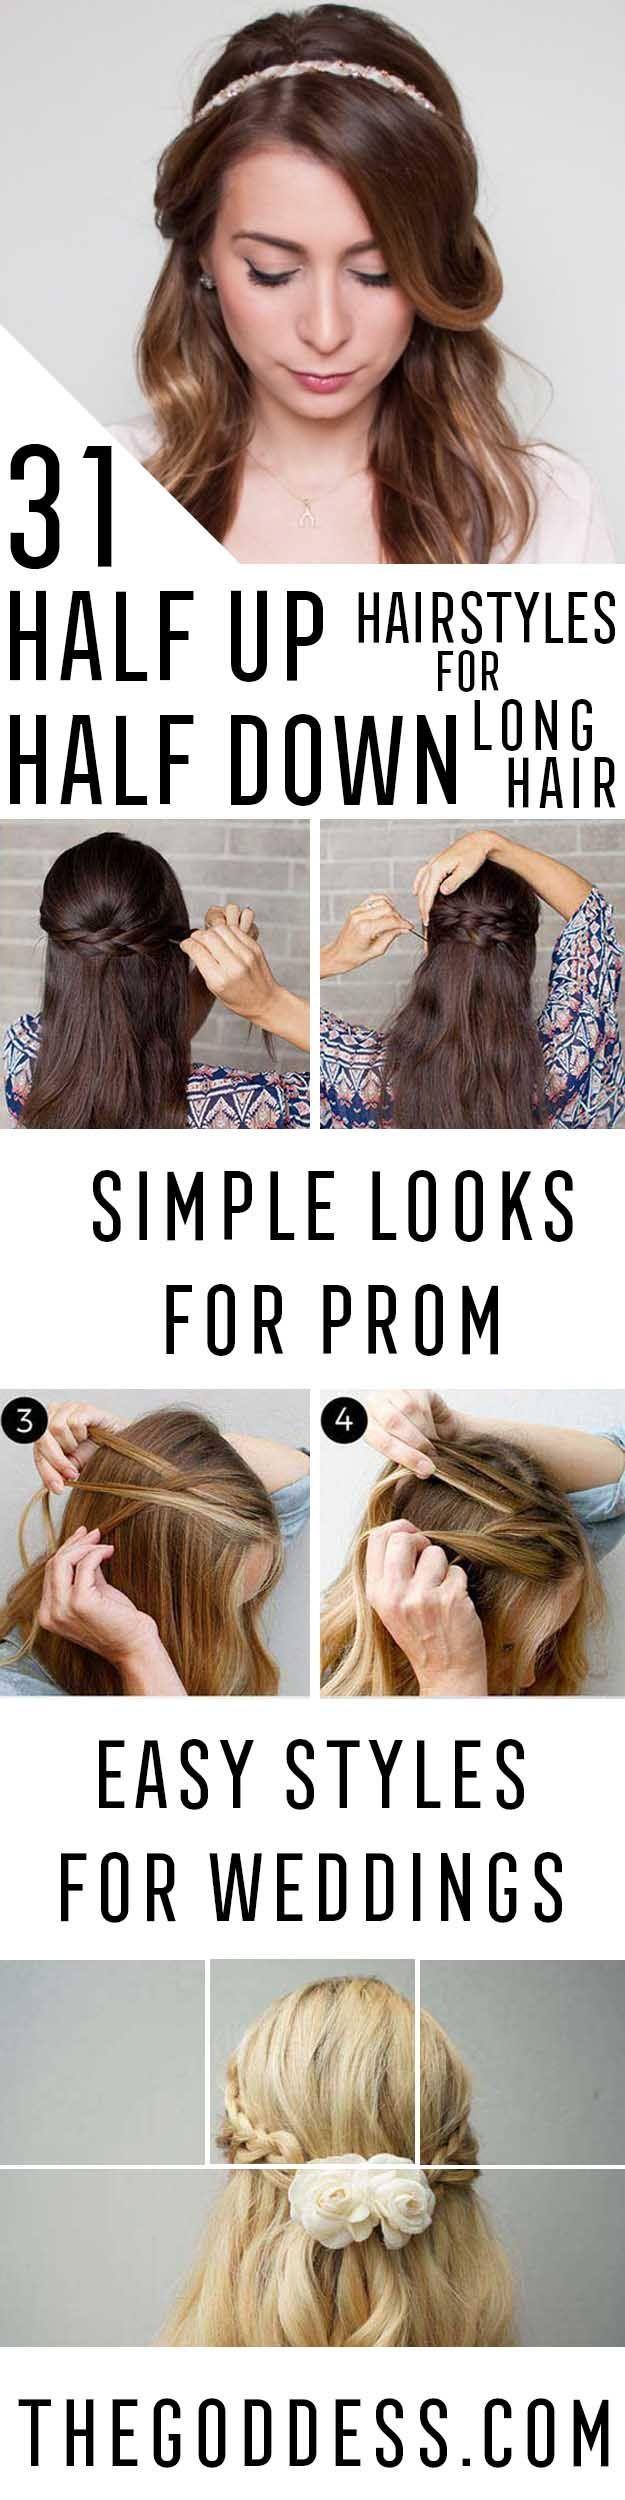 amazing half uphalf down hairstyles for long hair half